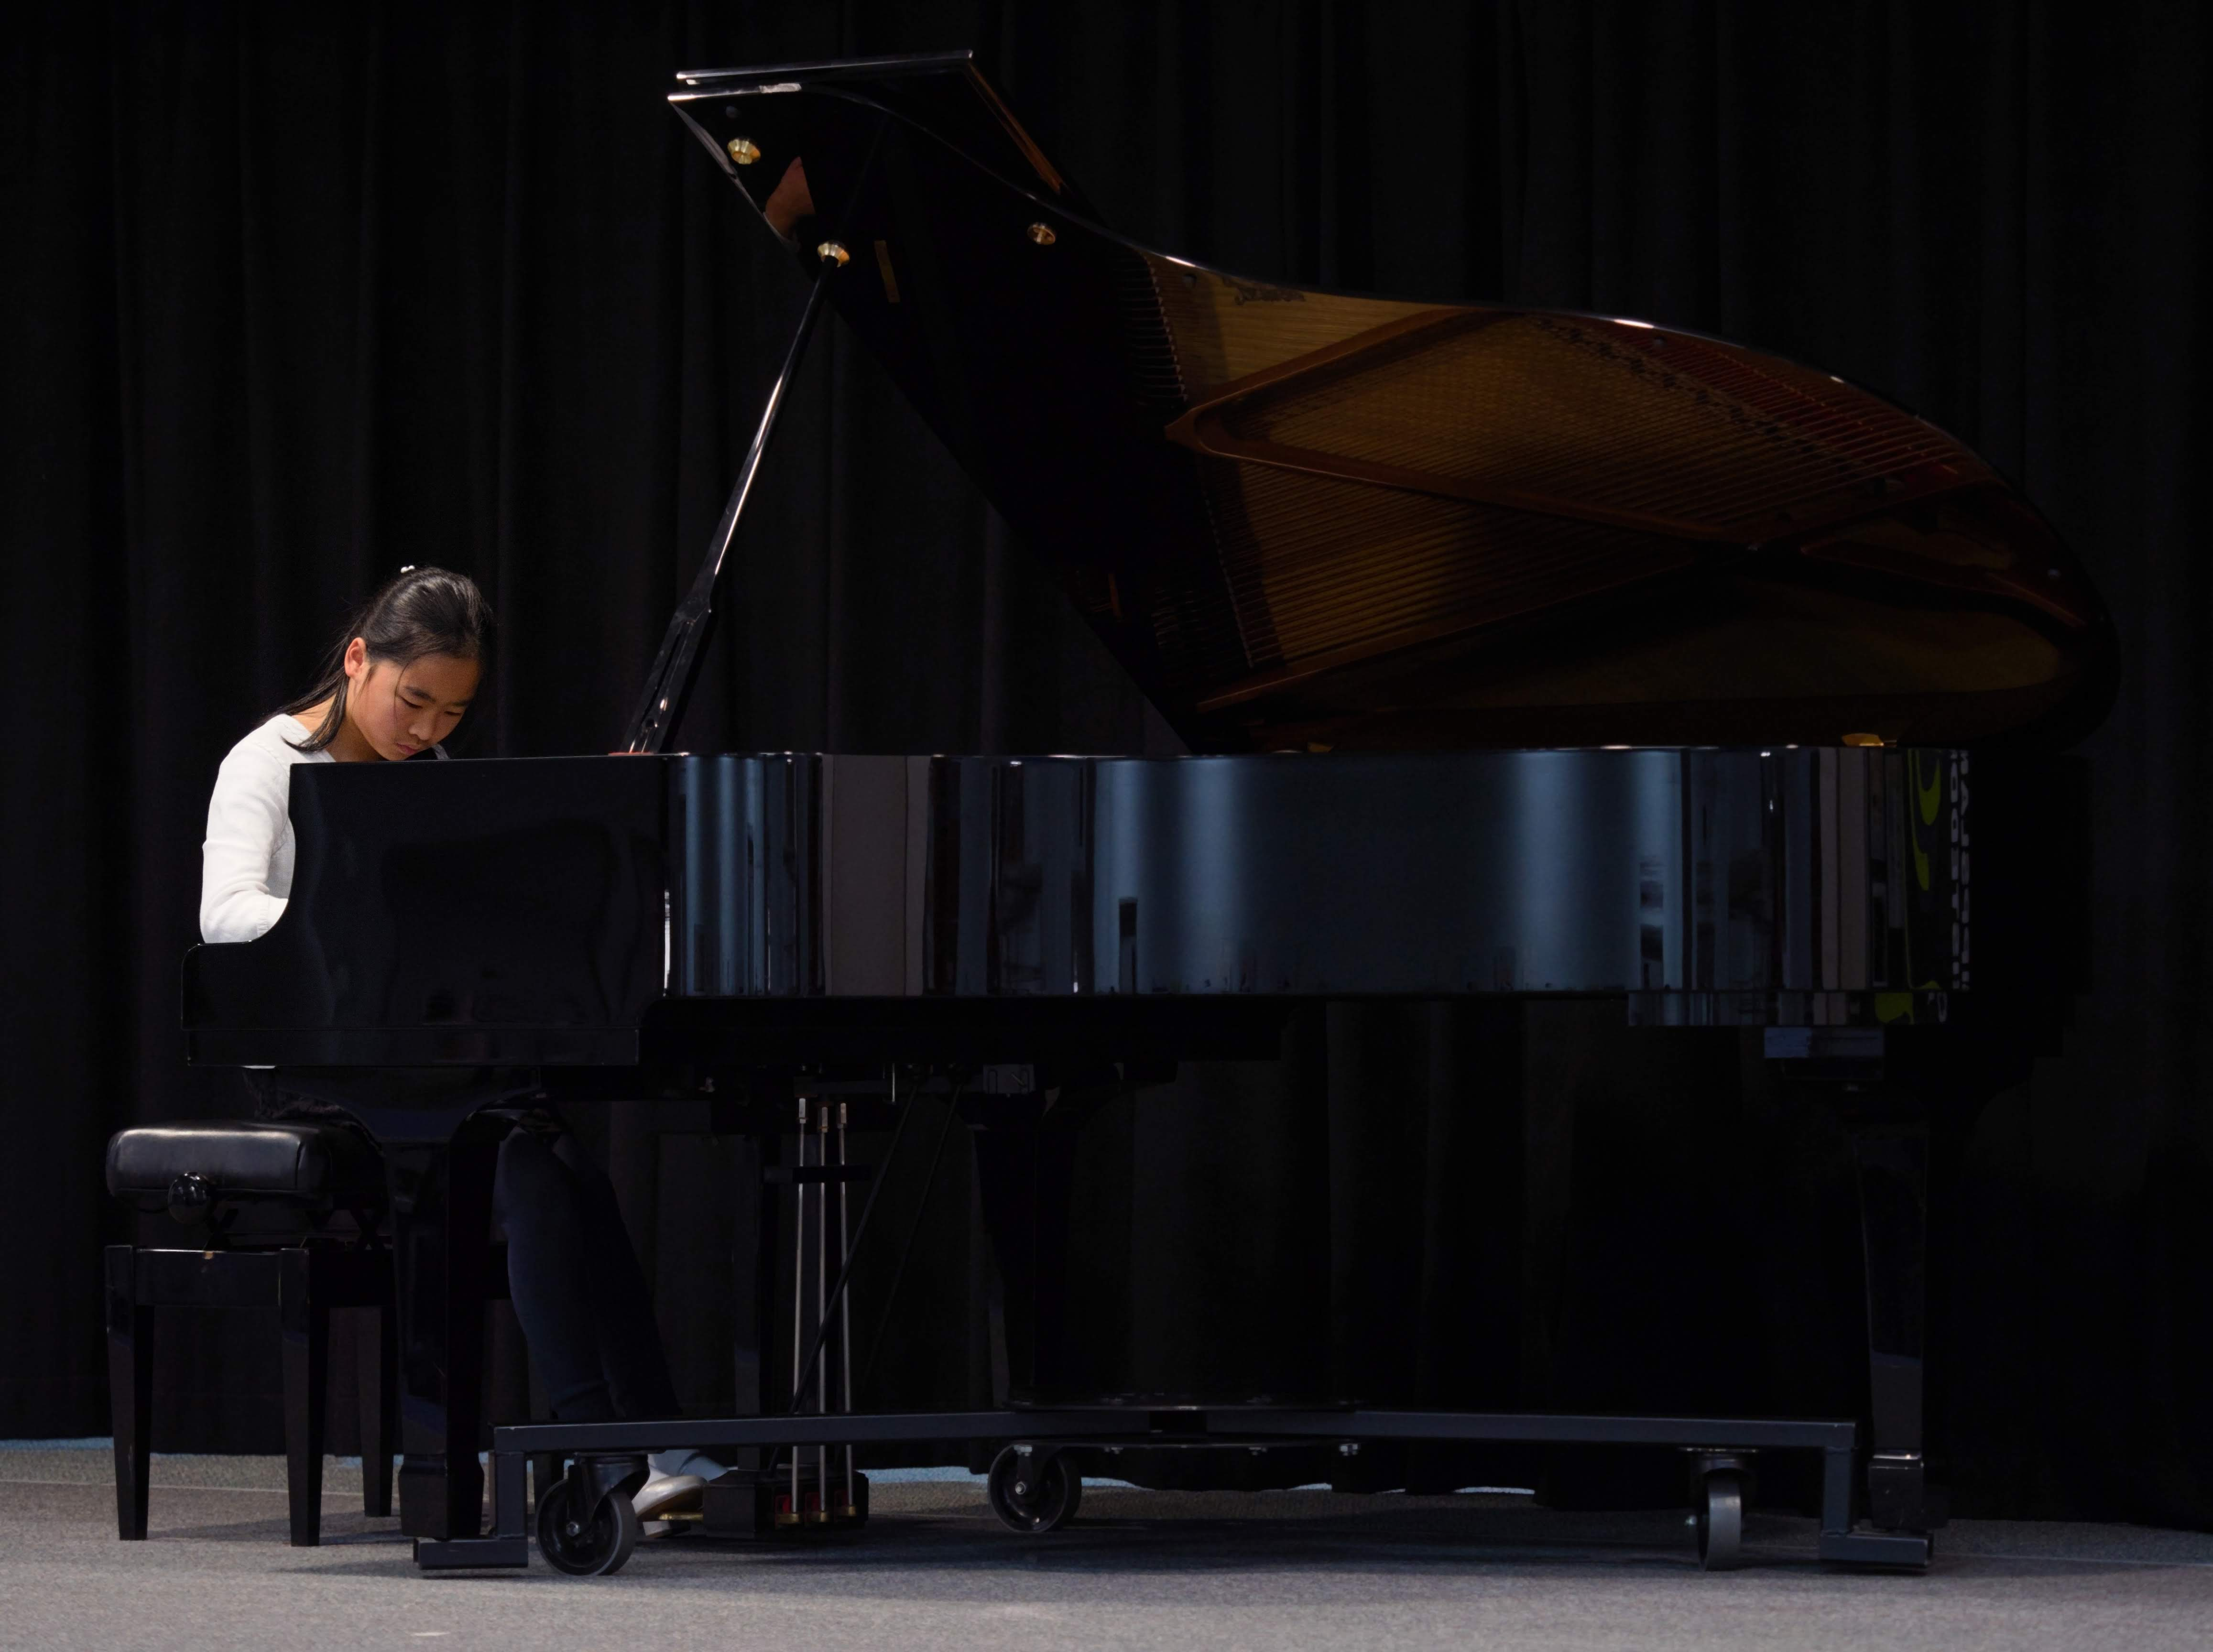 WGE Pianoforte Day 3 Sophia Yang Displays Her Skills on the Piano